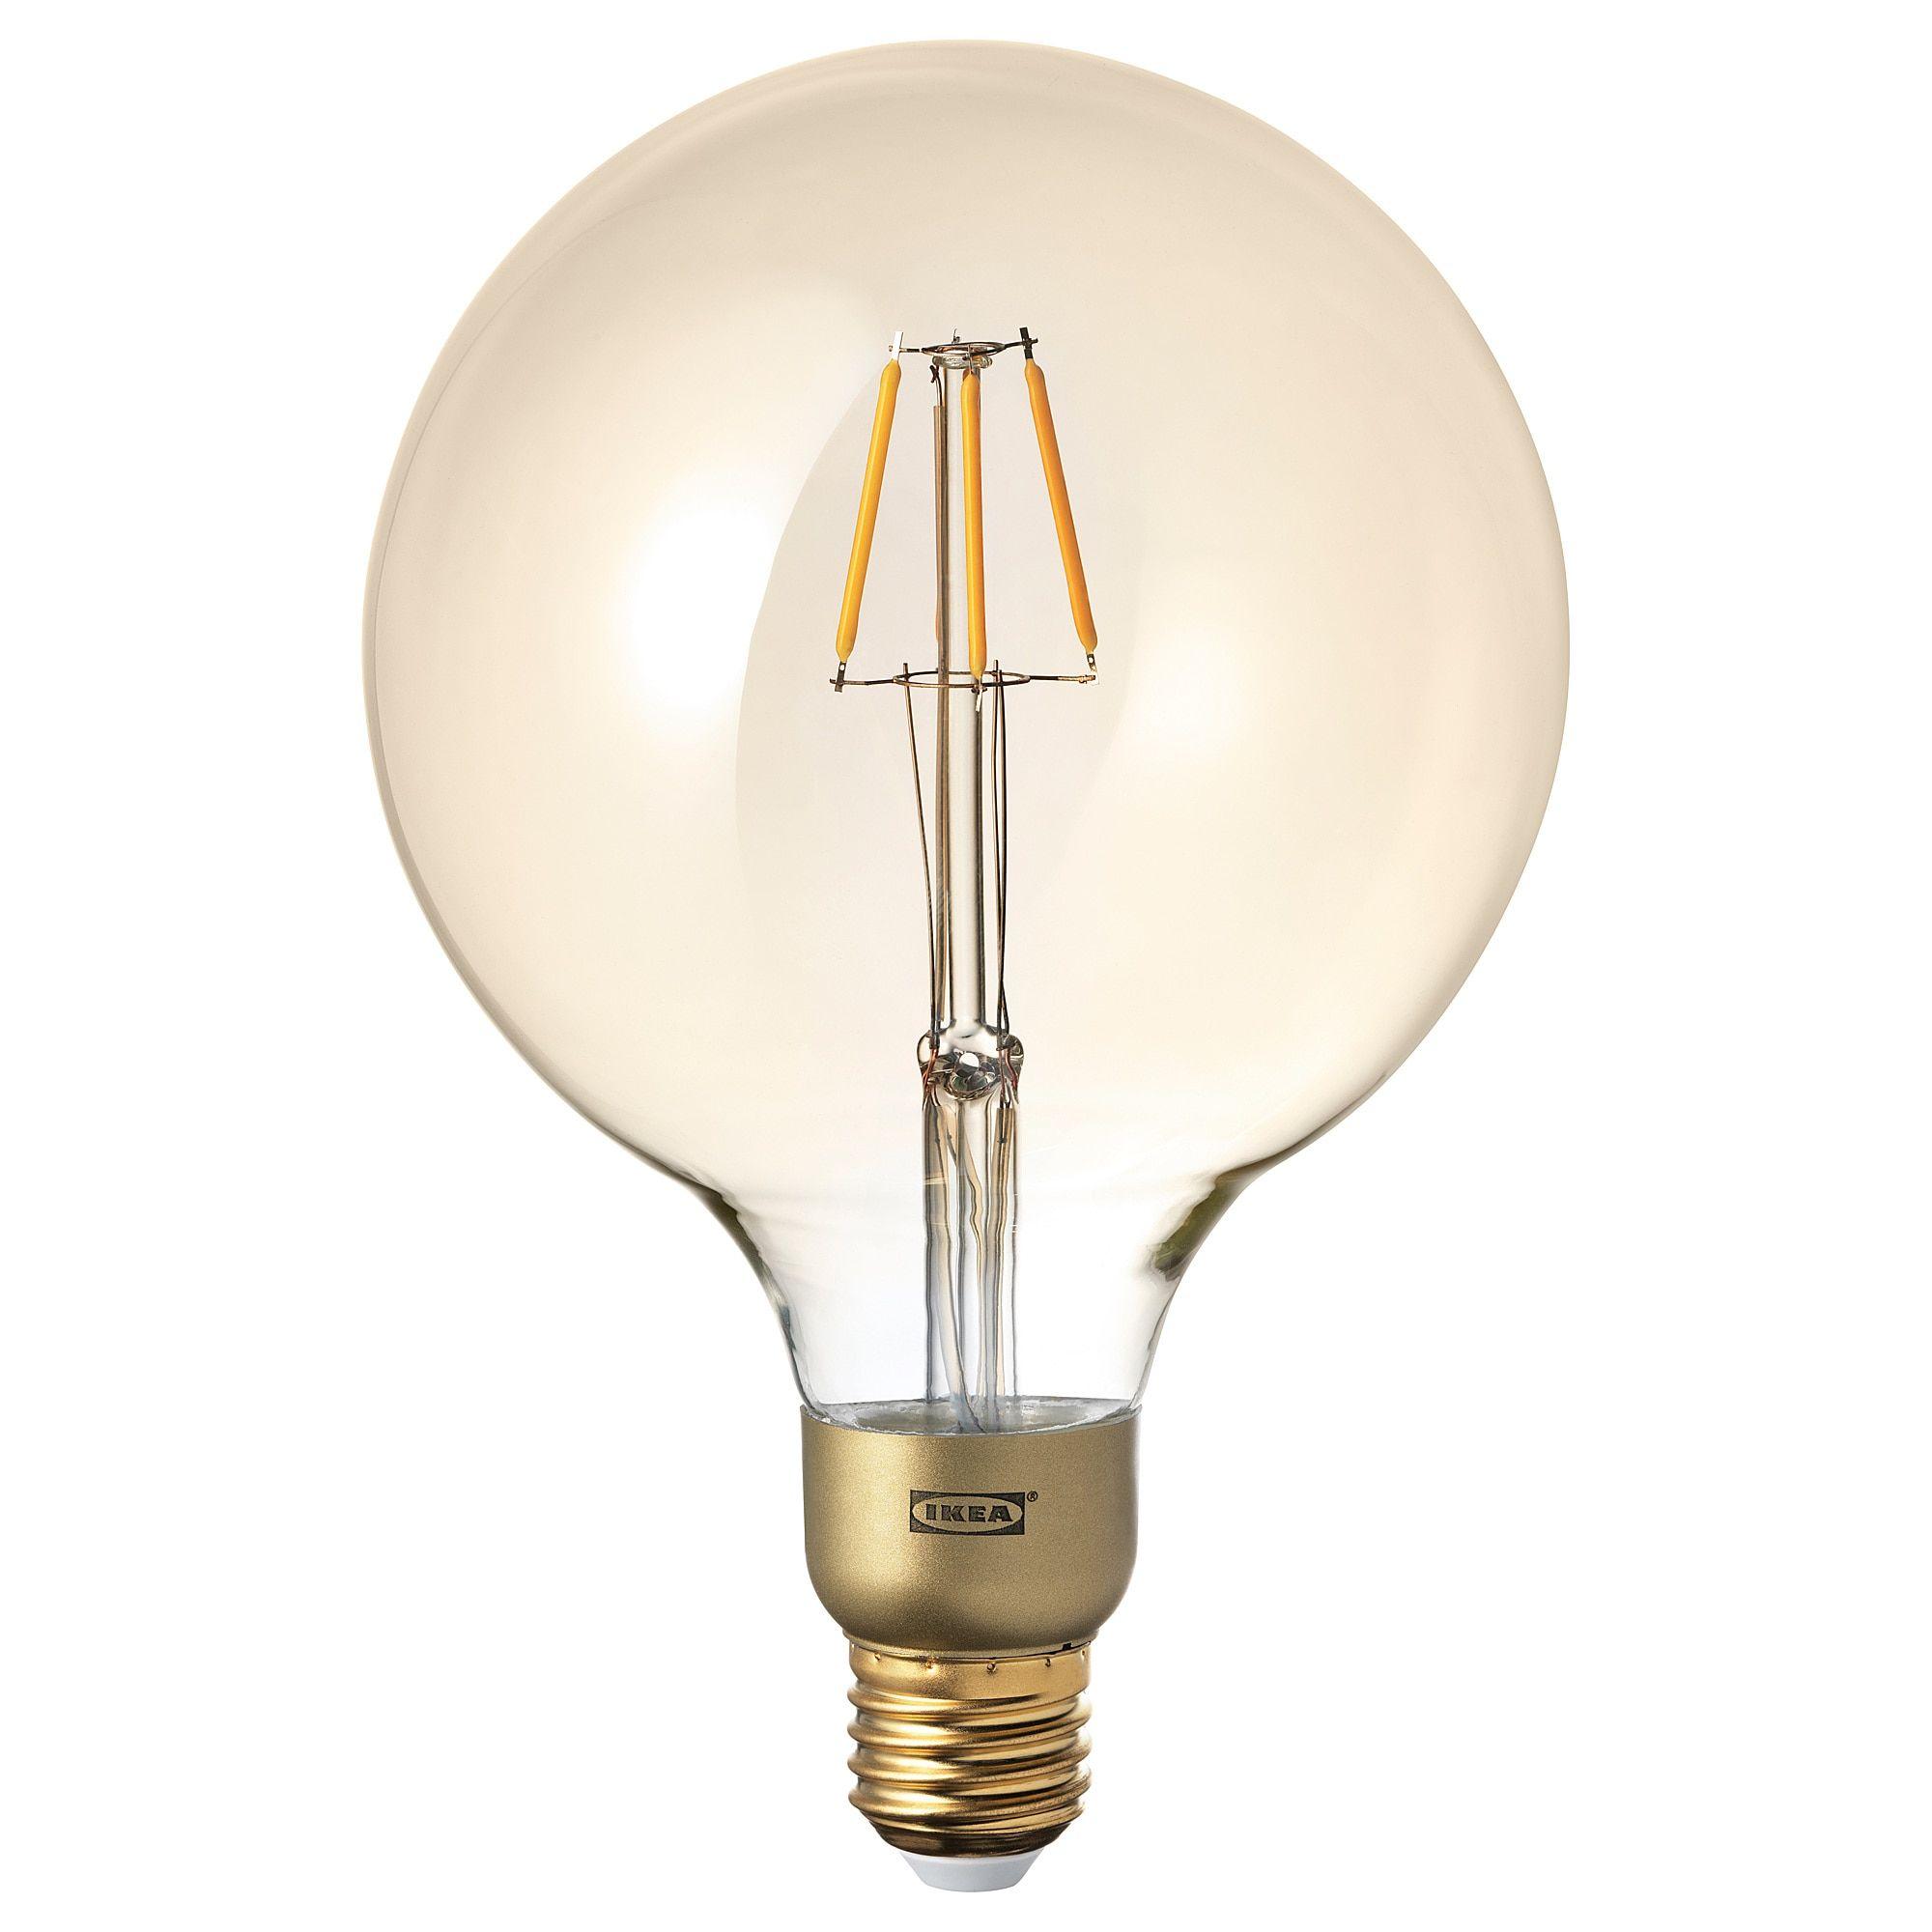 E27 Leuchtmittel IKEA NITTIO LED-Lampe in kupferfarben; rund